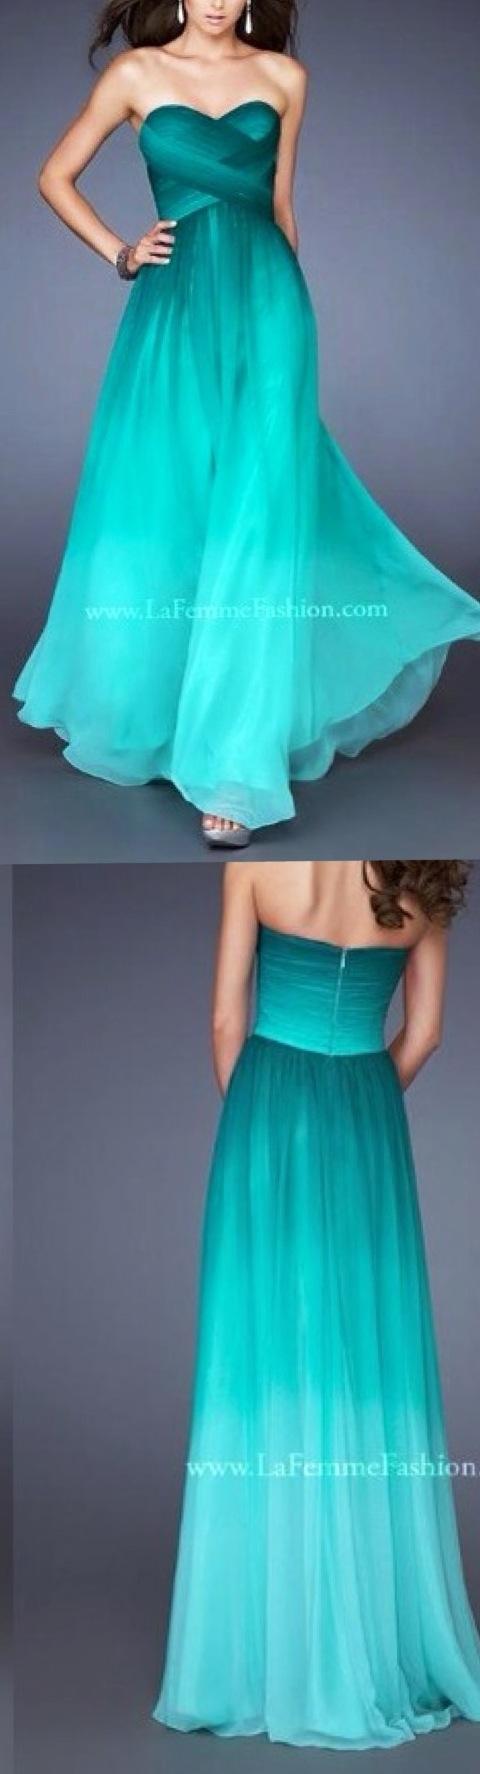 Aqua dress this is like my dream dress